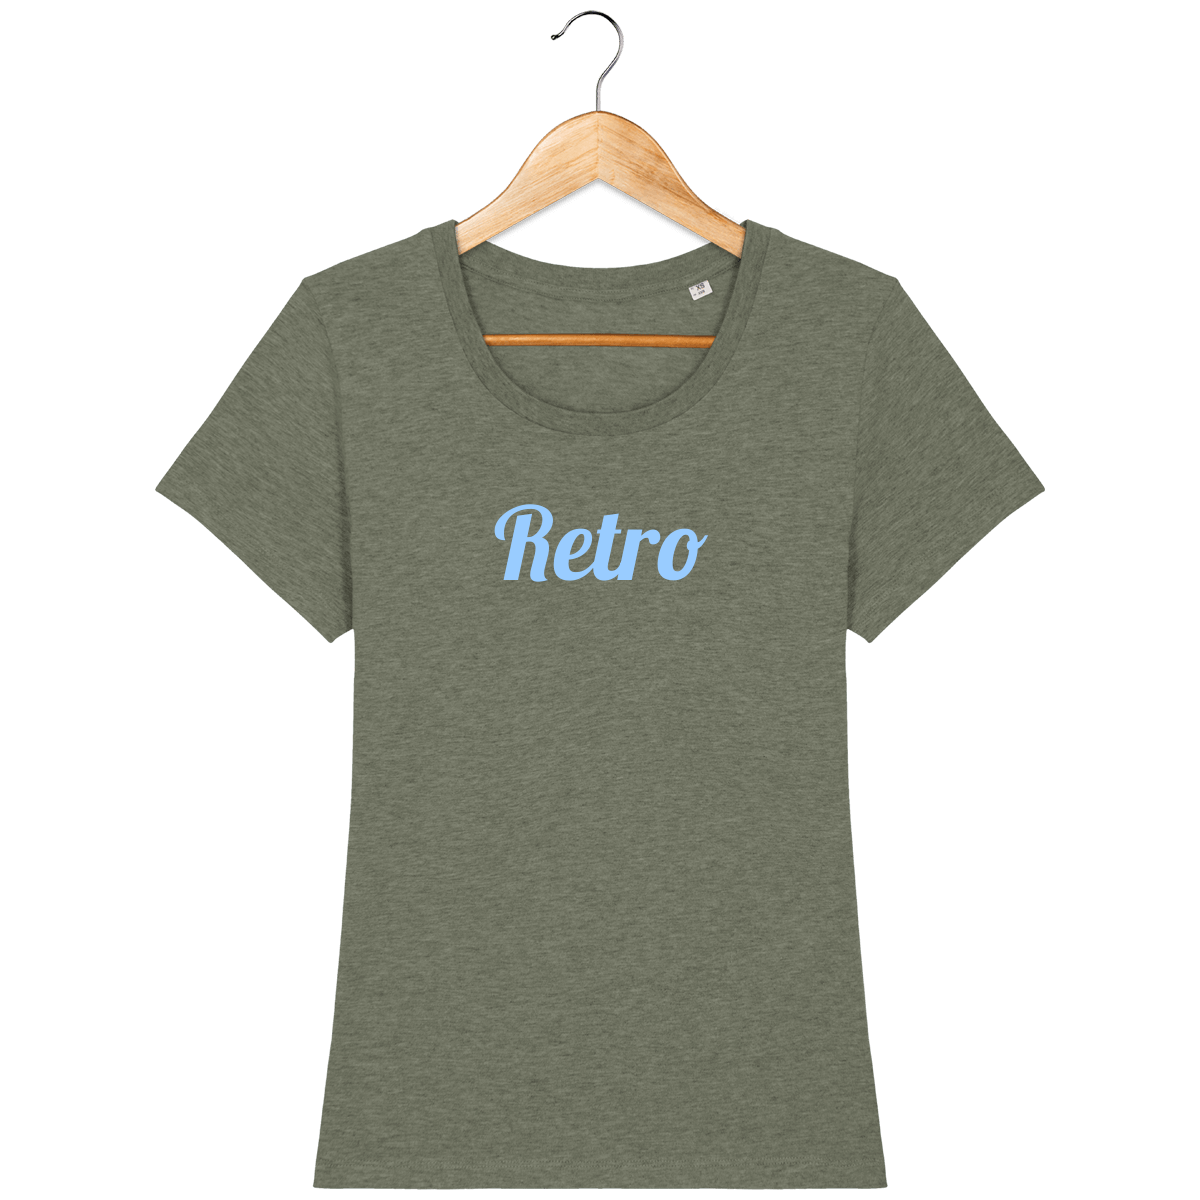 tshirt-bio-retro-heatherblackdenim-paleblue_mid-heather-khaki_face